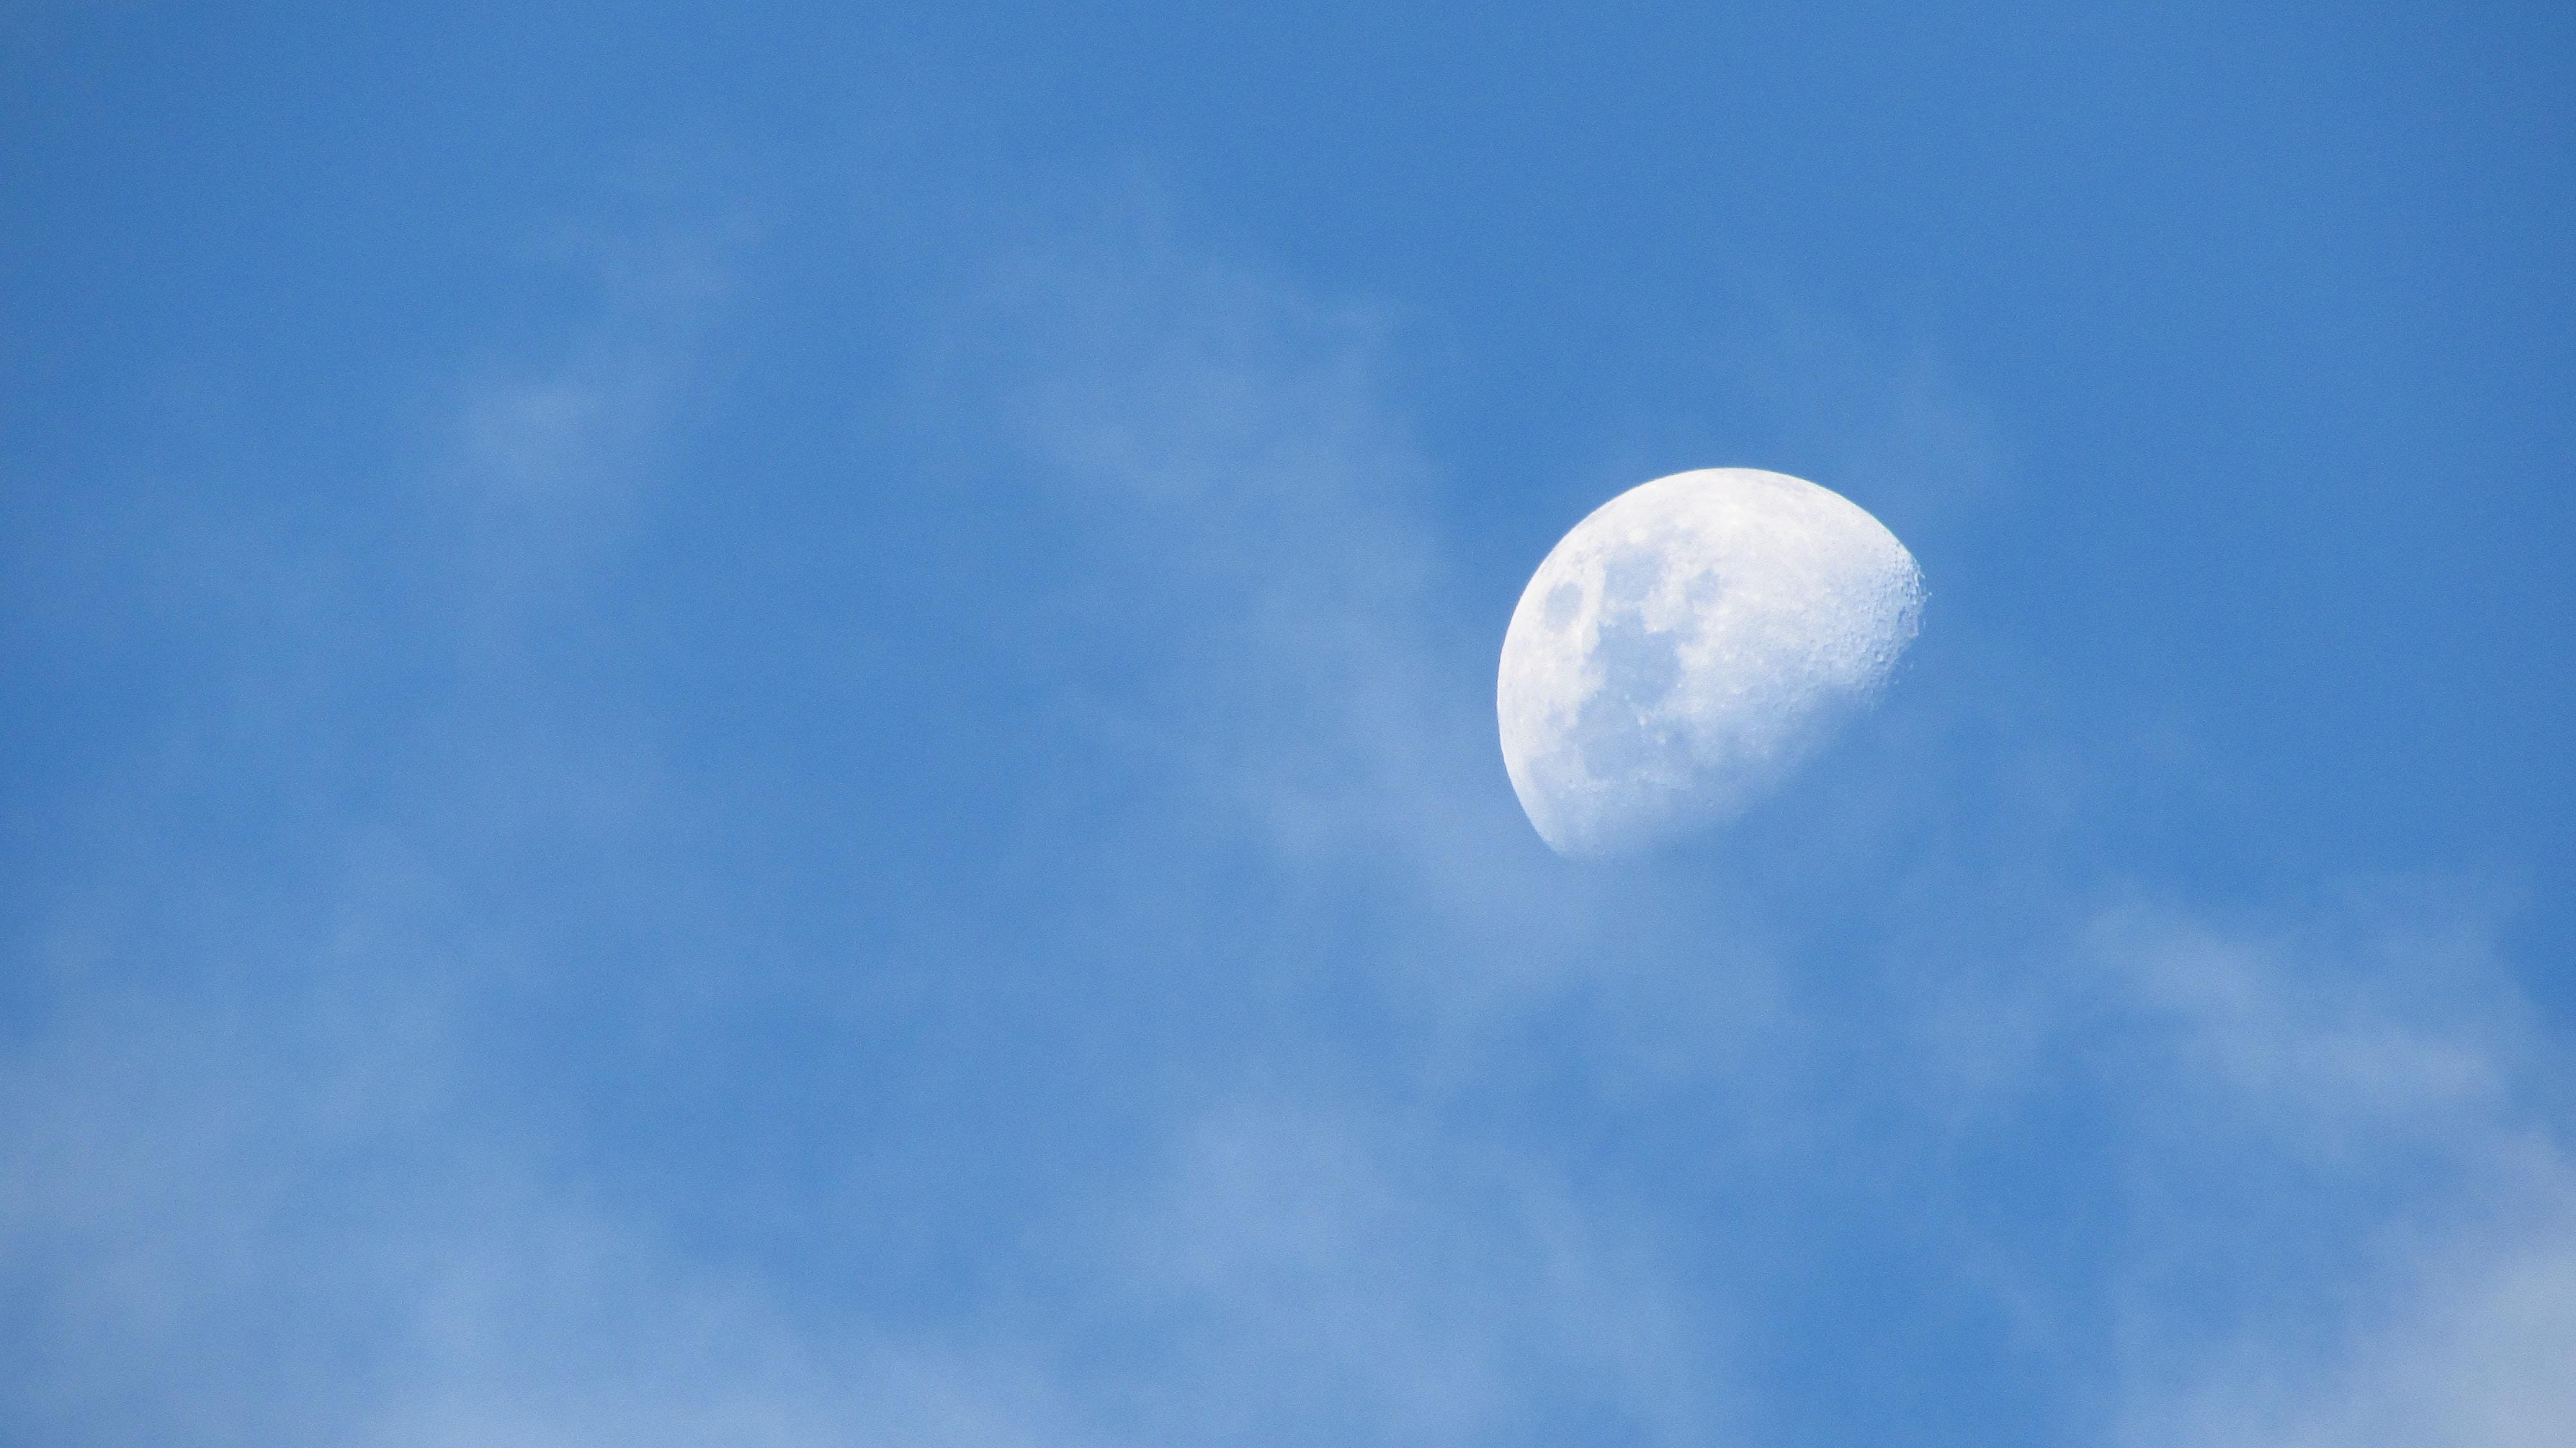 low angle photo of half-moon